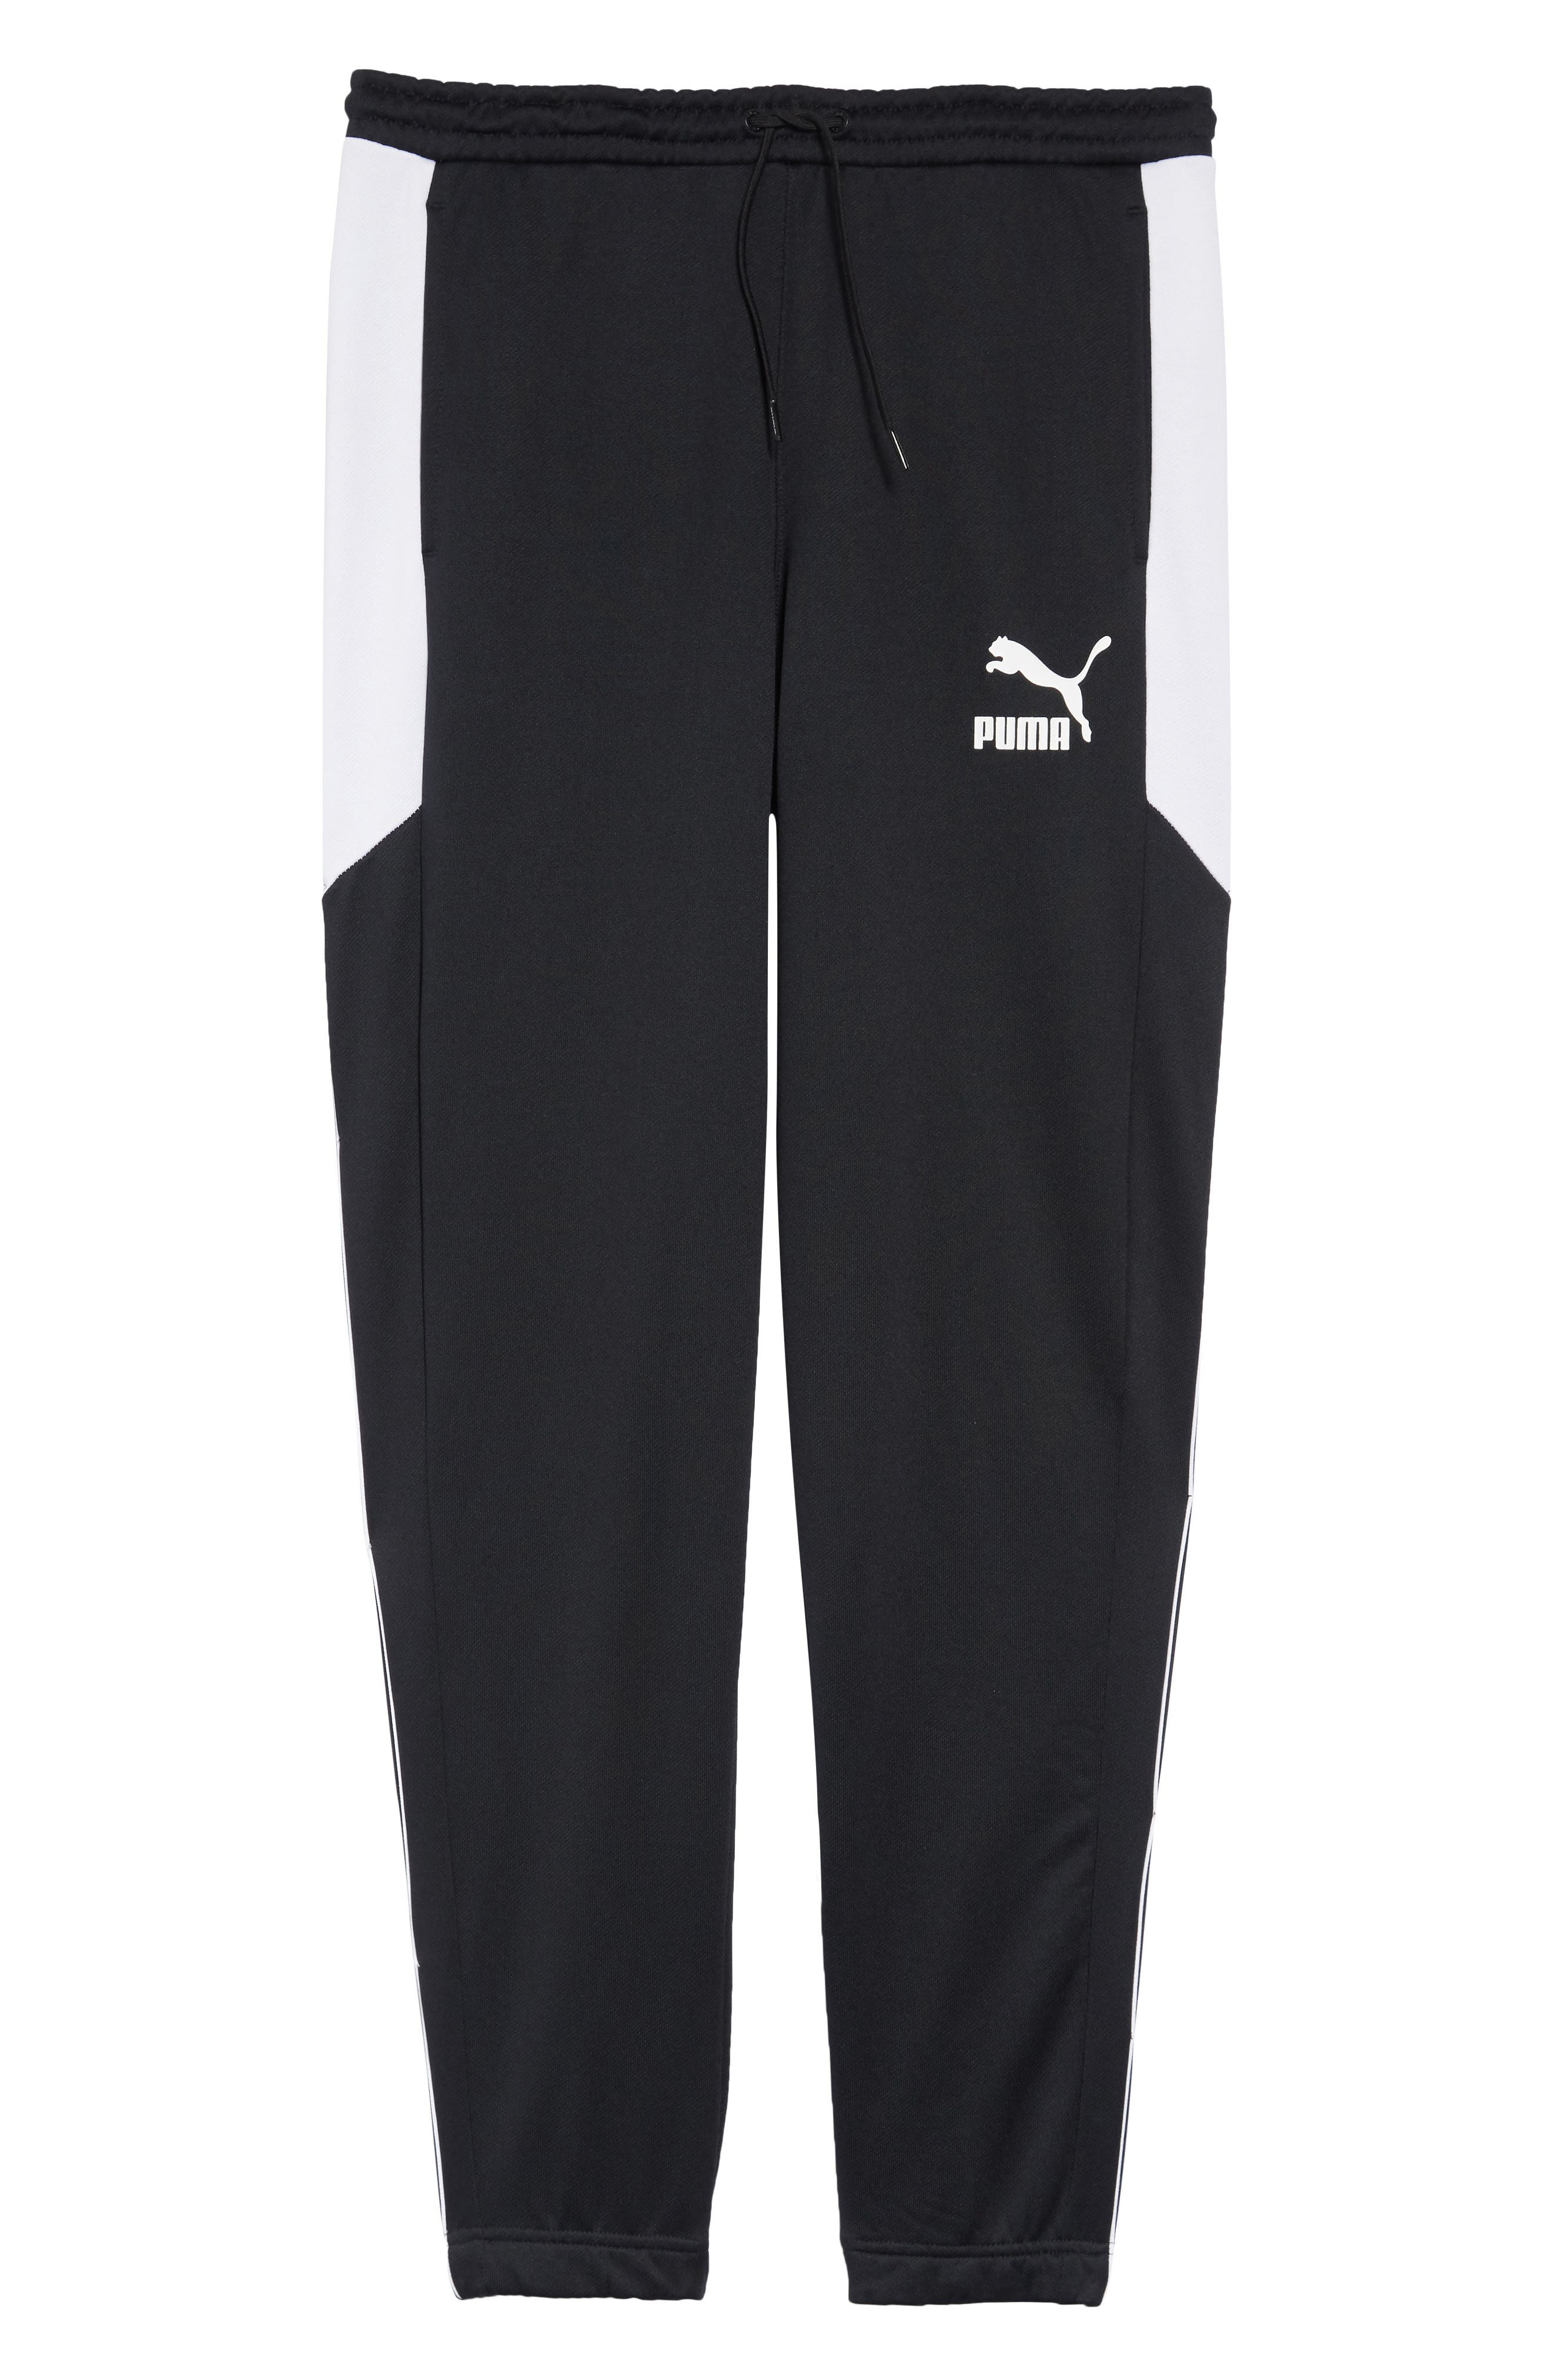 Retro Sweatpants,                             Alternate thumbnail 6, color,                             PUMA BLACK